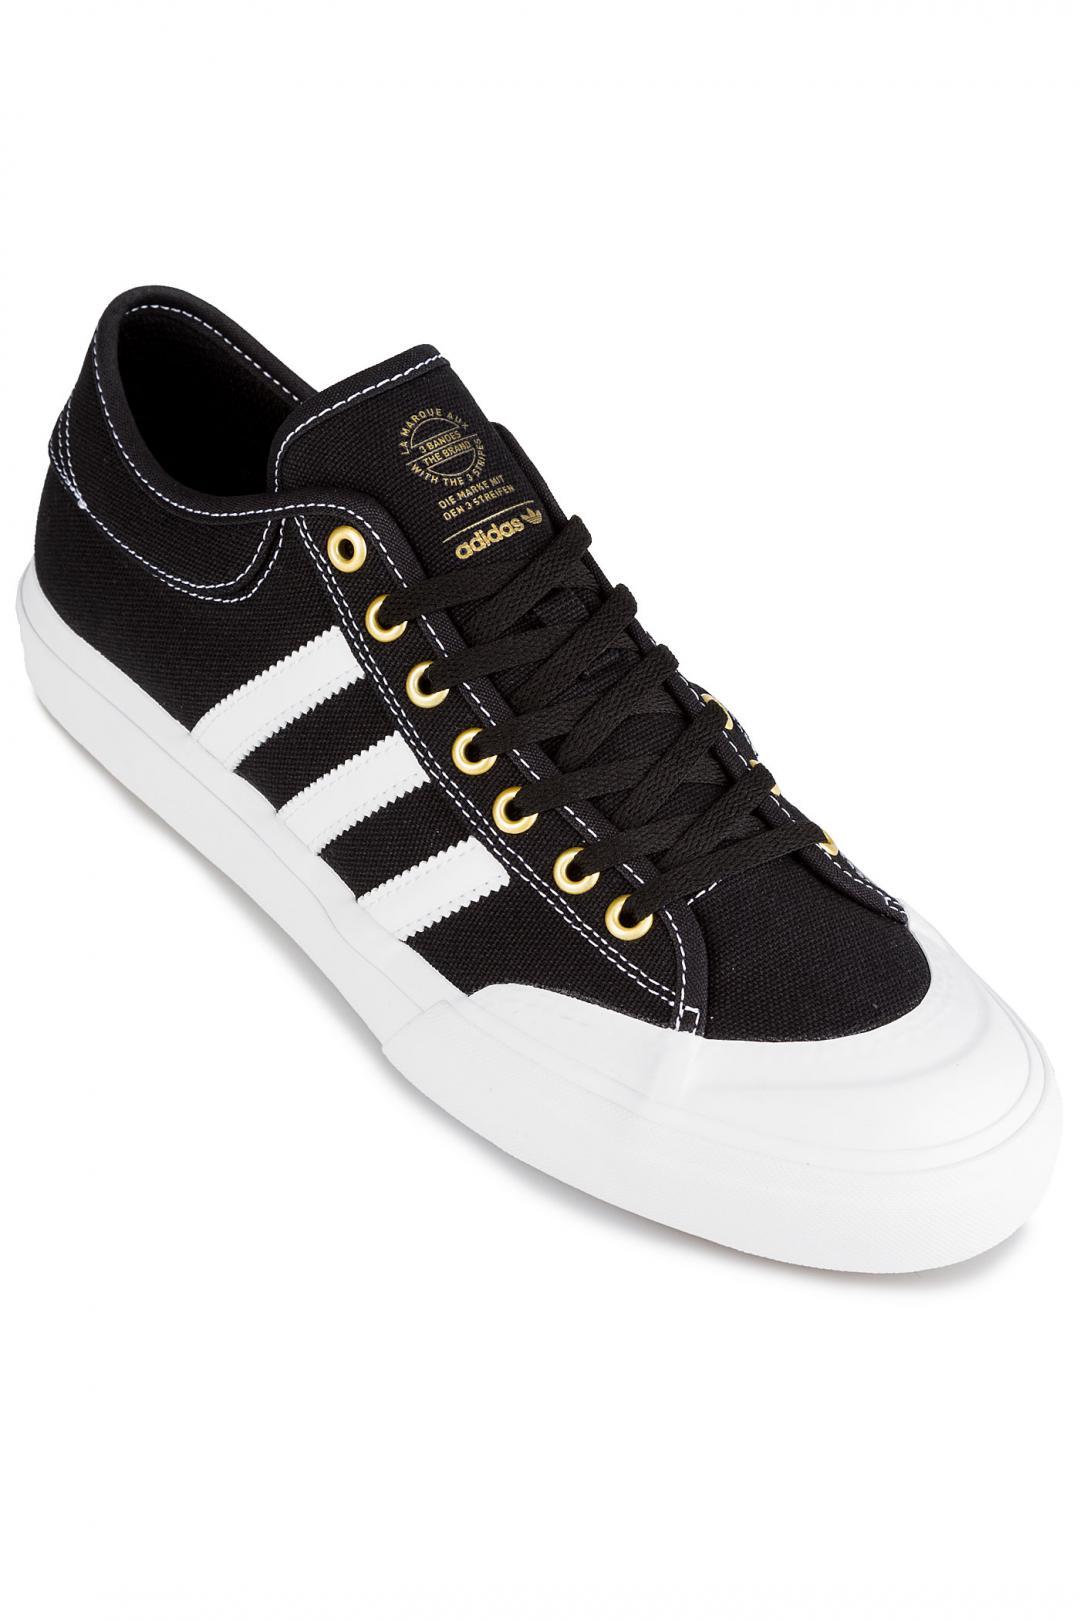 Uomo adidas Skateboarding Matchcourt core black white gold | Sneakers low top